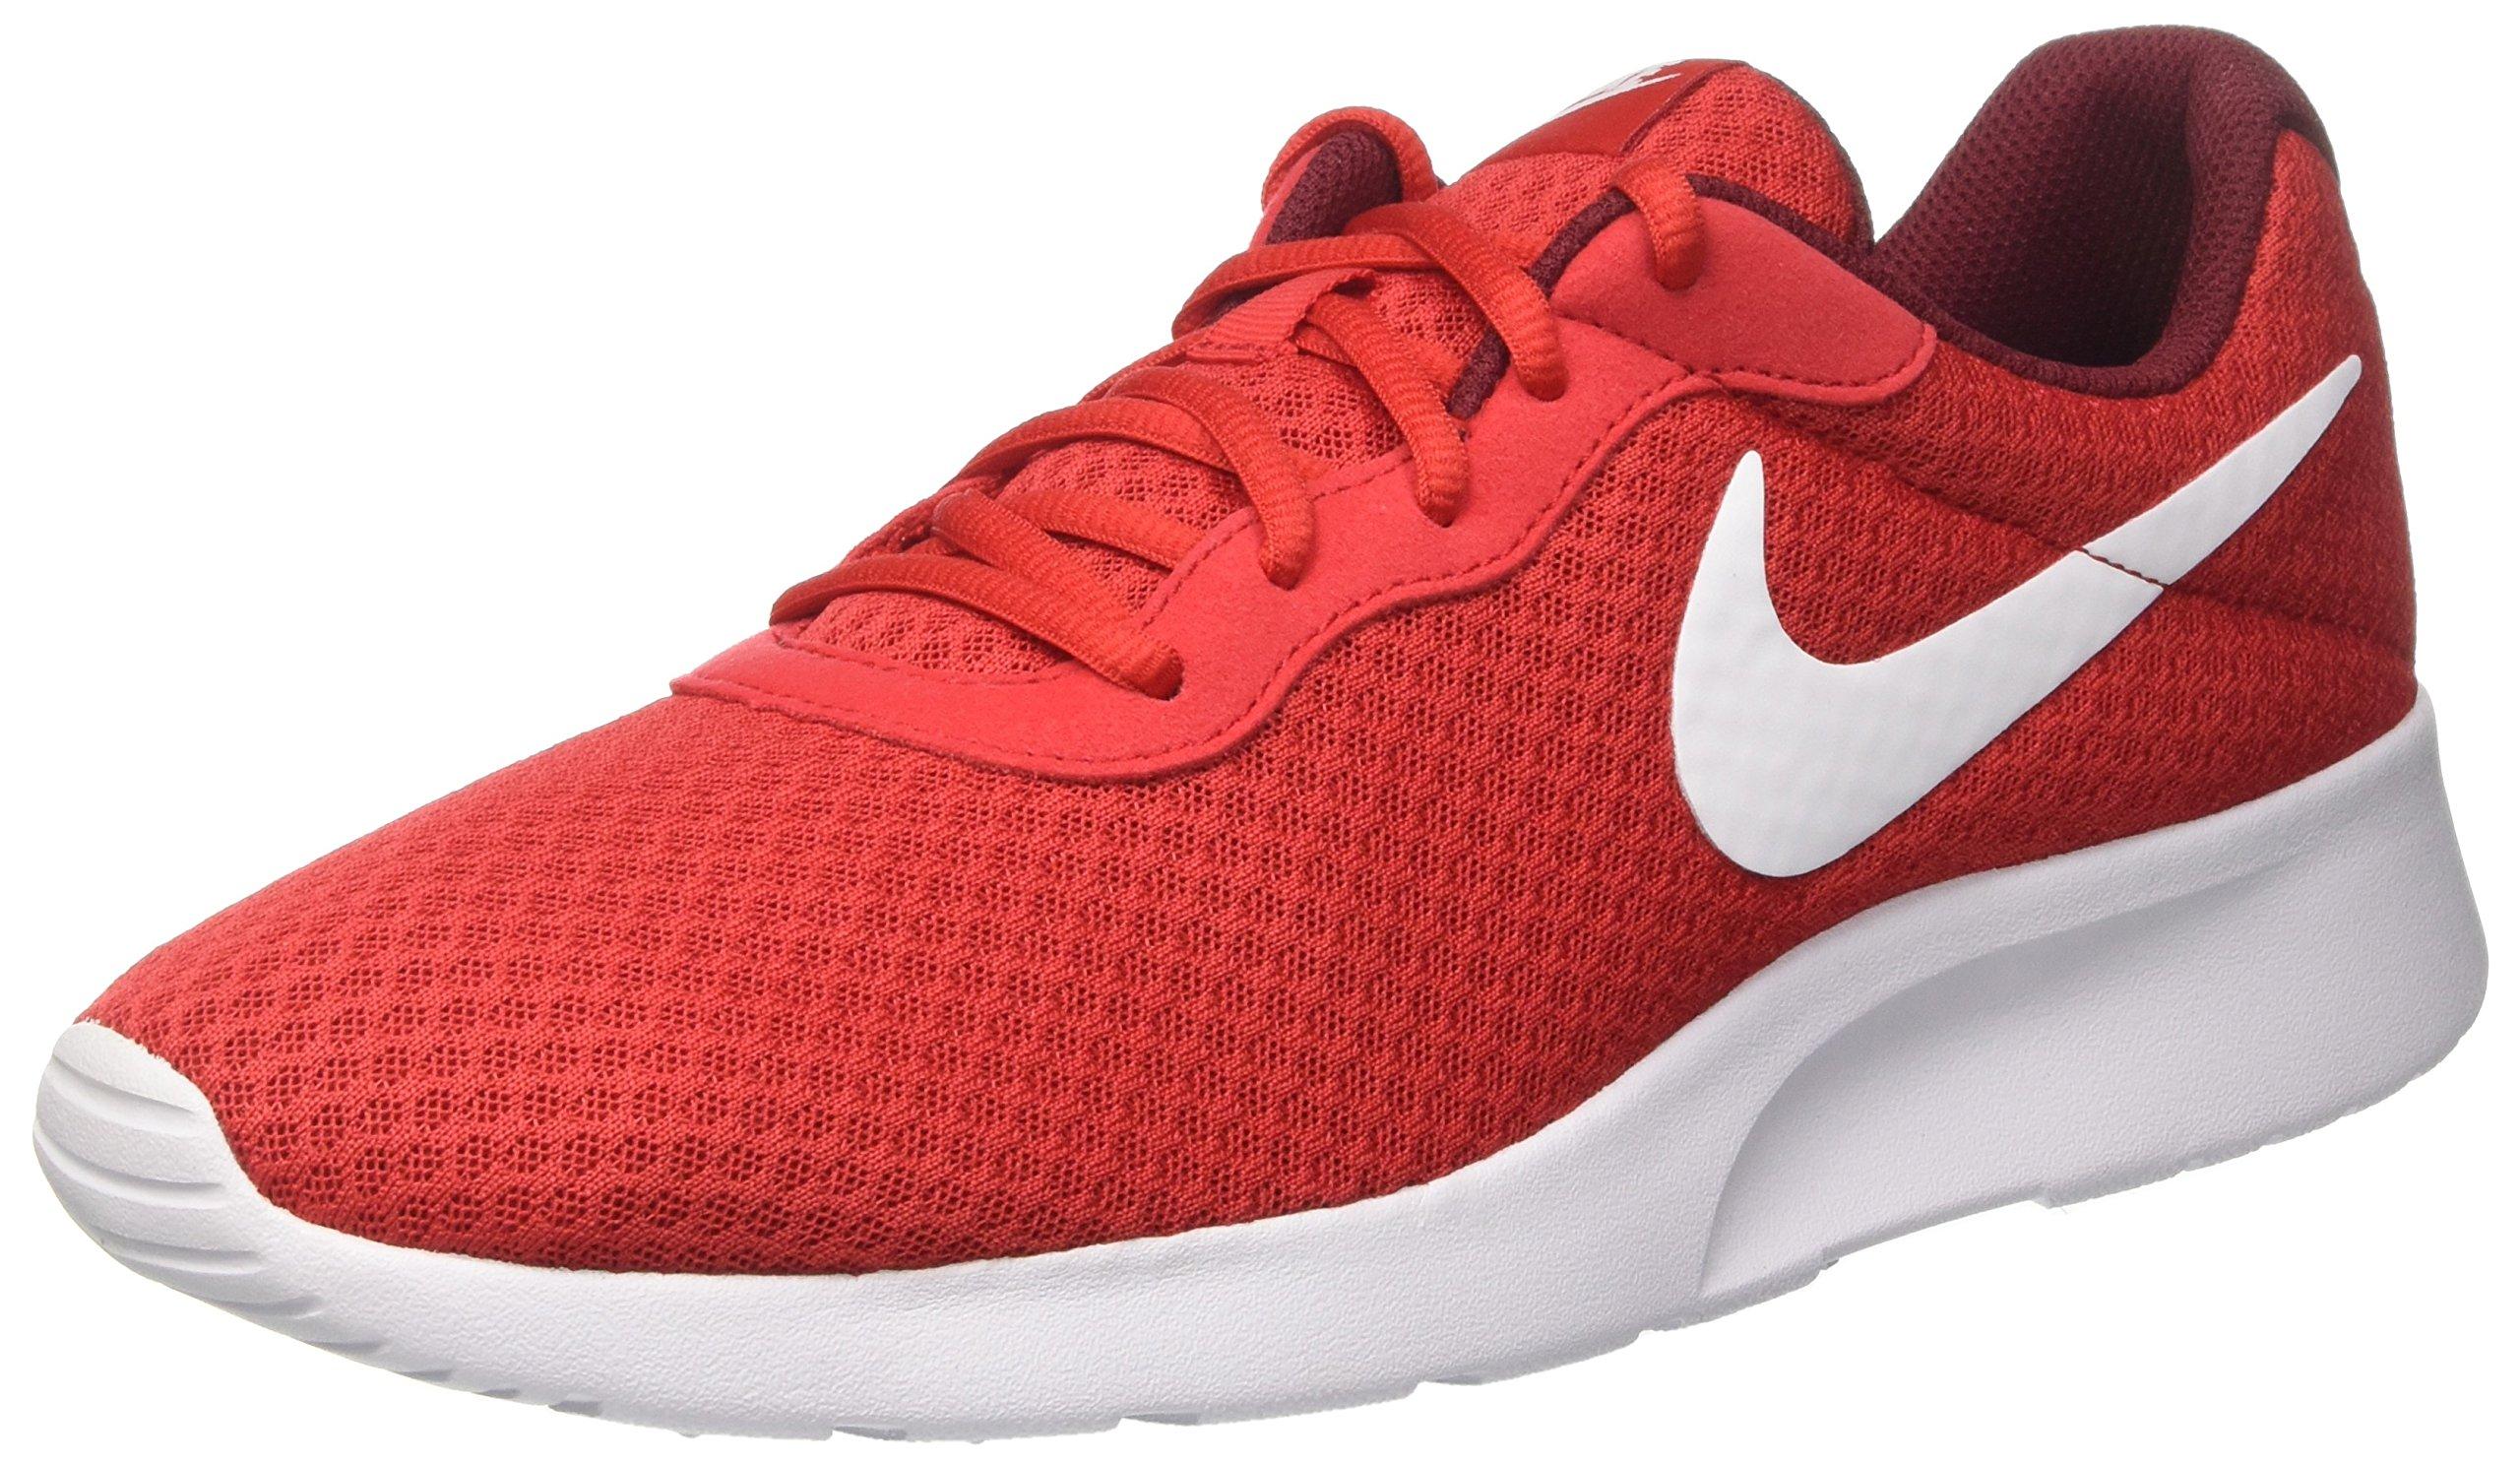 Nike 812654-010, Zapatillas Unisex Adulto